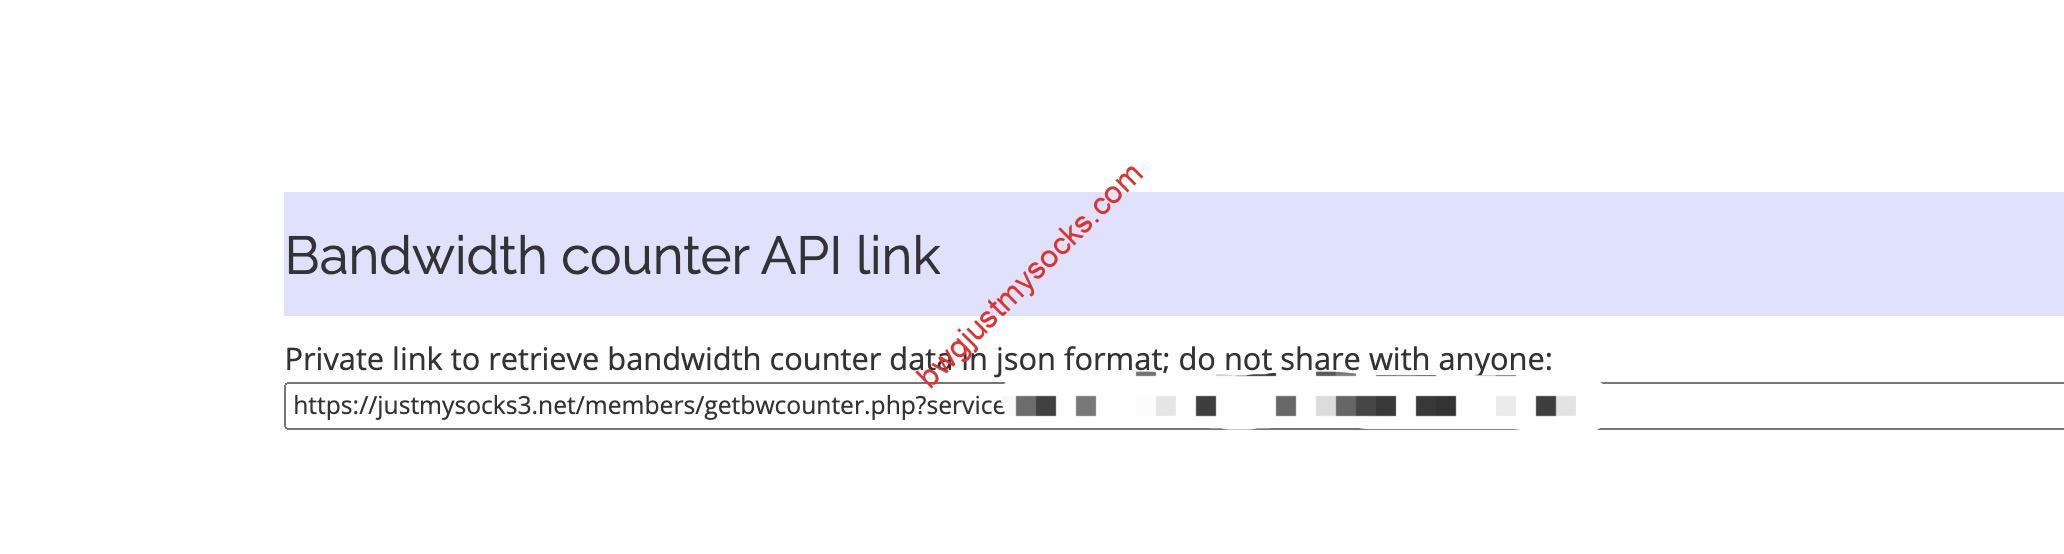 Just My Socks Bandwidth counter API link